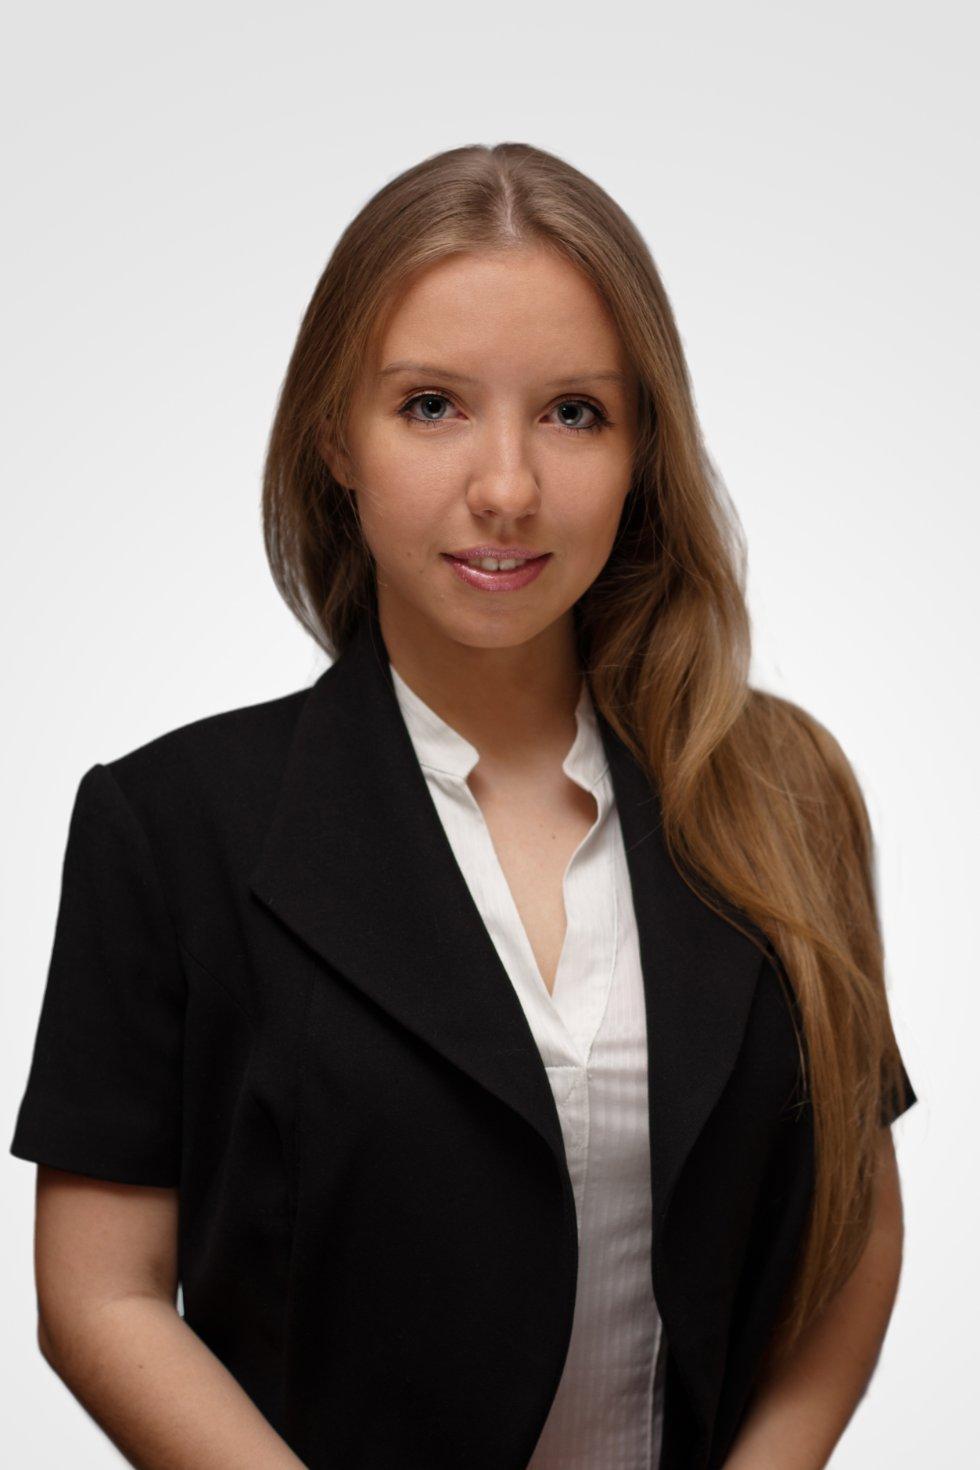 Жучкова Ольга Сергеевна